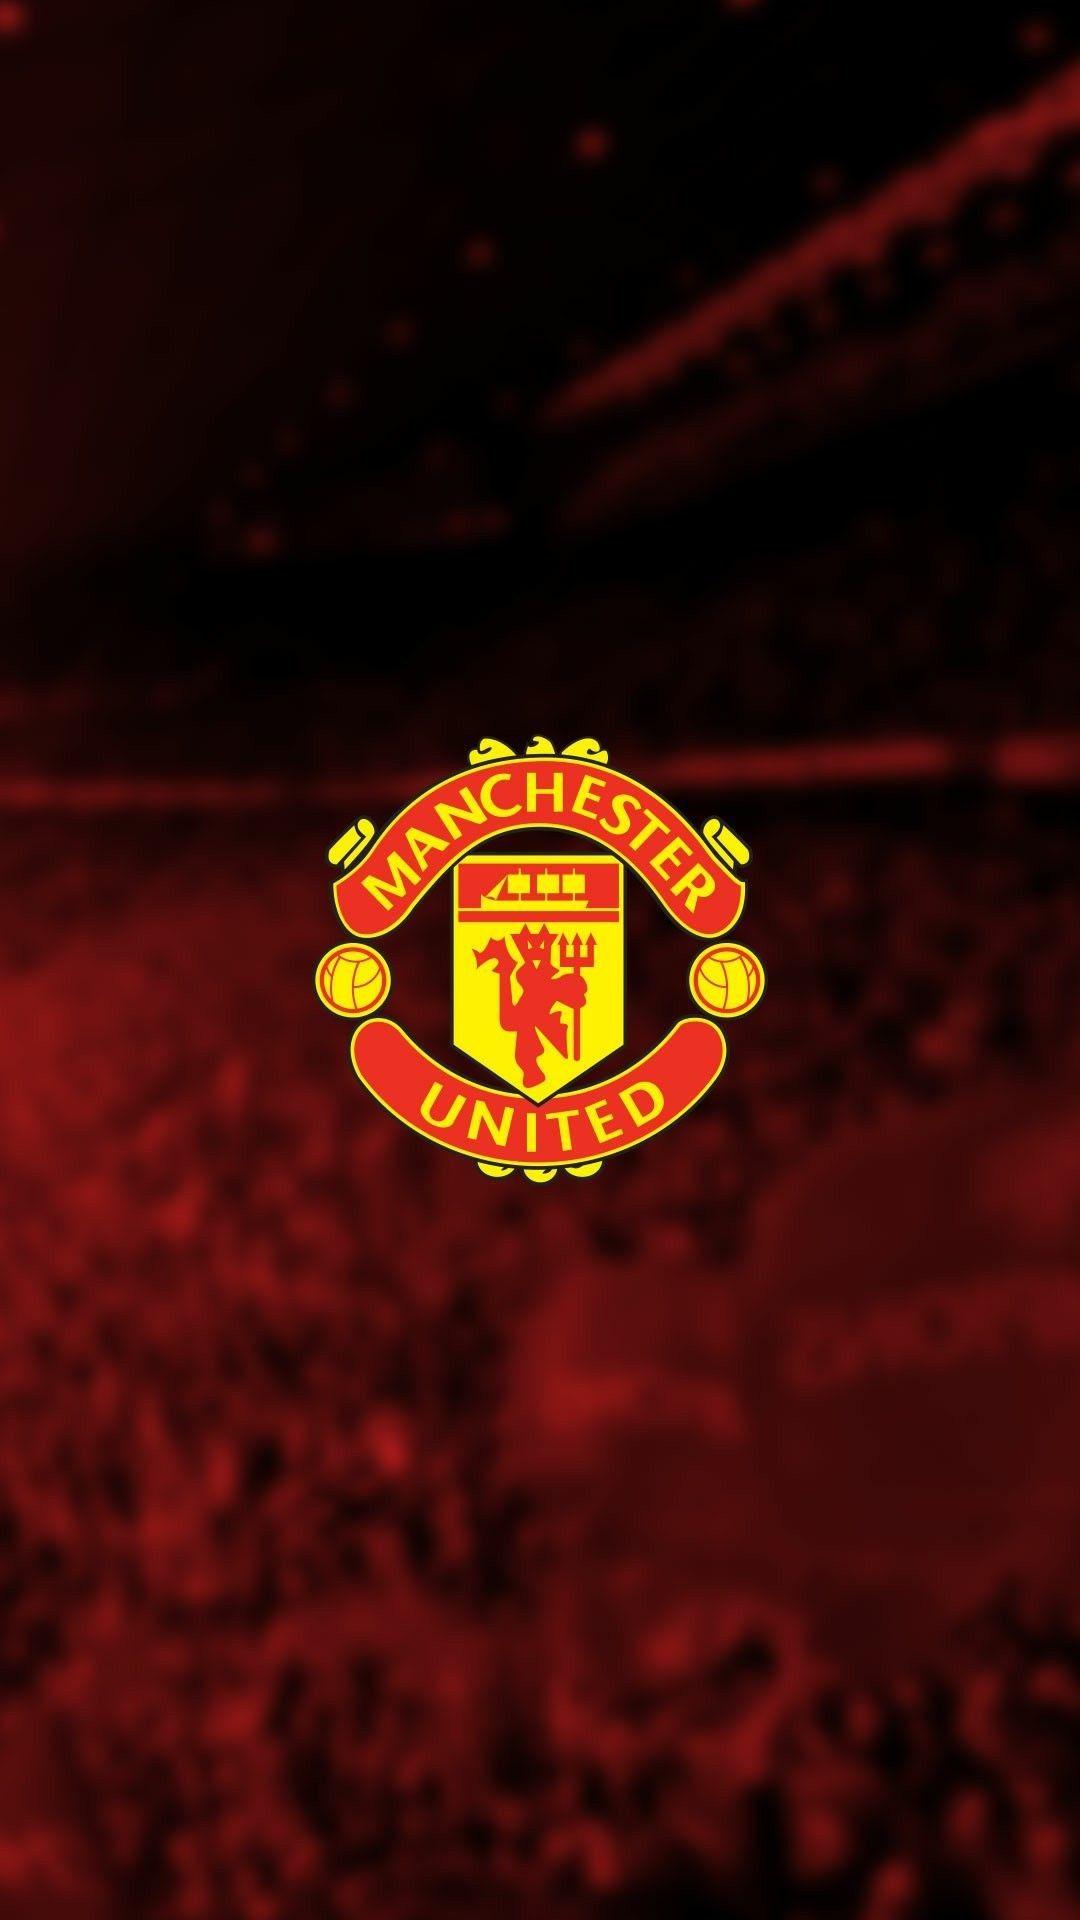 Manchester United Logo Wallpapers On Wallpaperdog